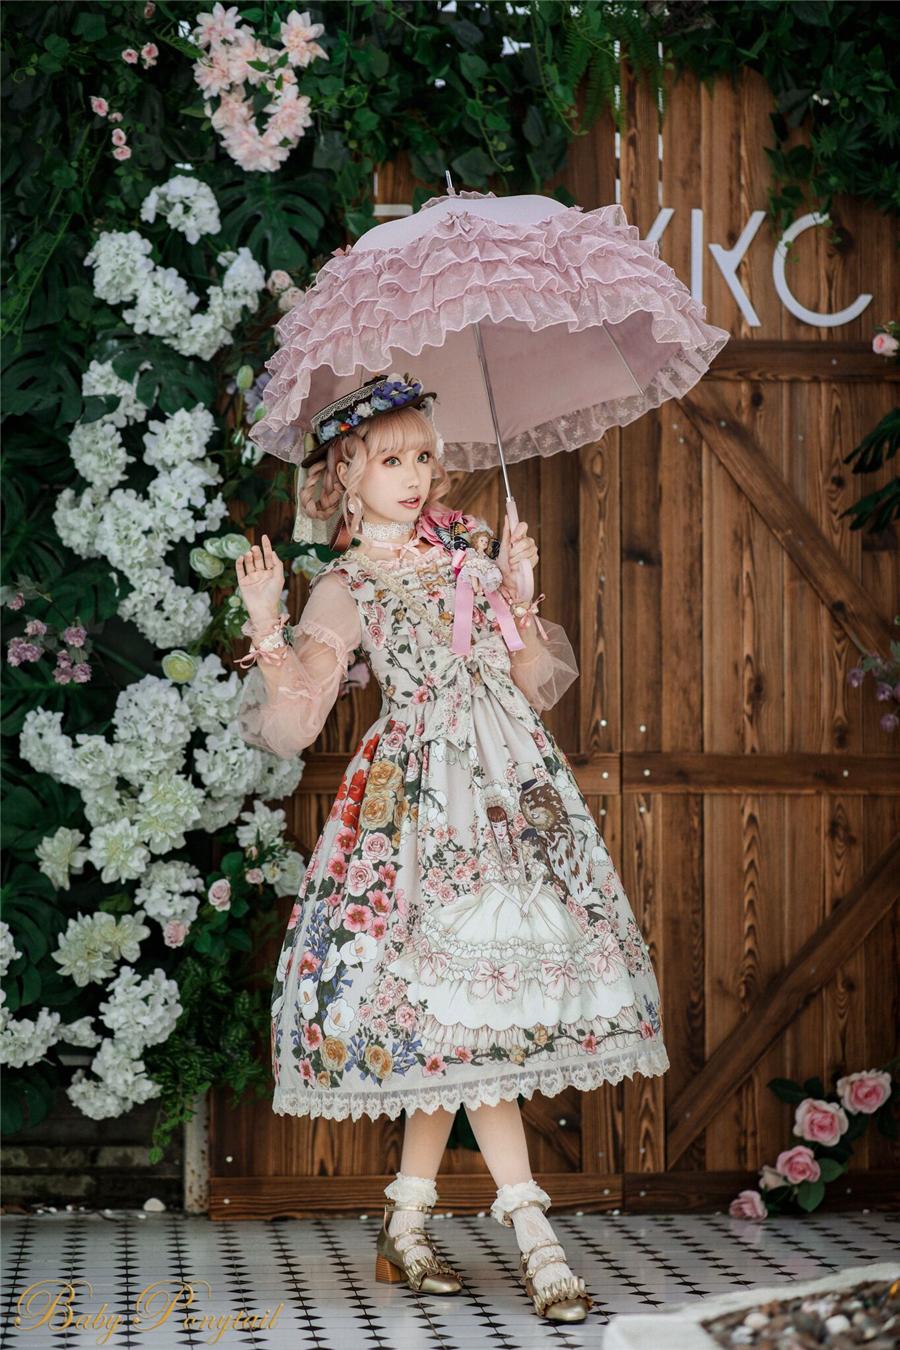 Polly's Garden of Dreams_Model Photo_Ivory JSK_Kaka_08.jpg